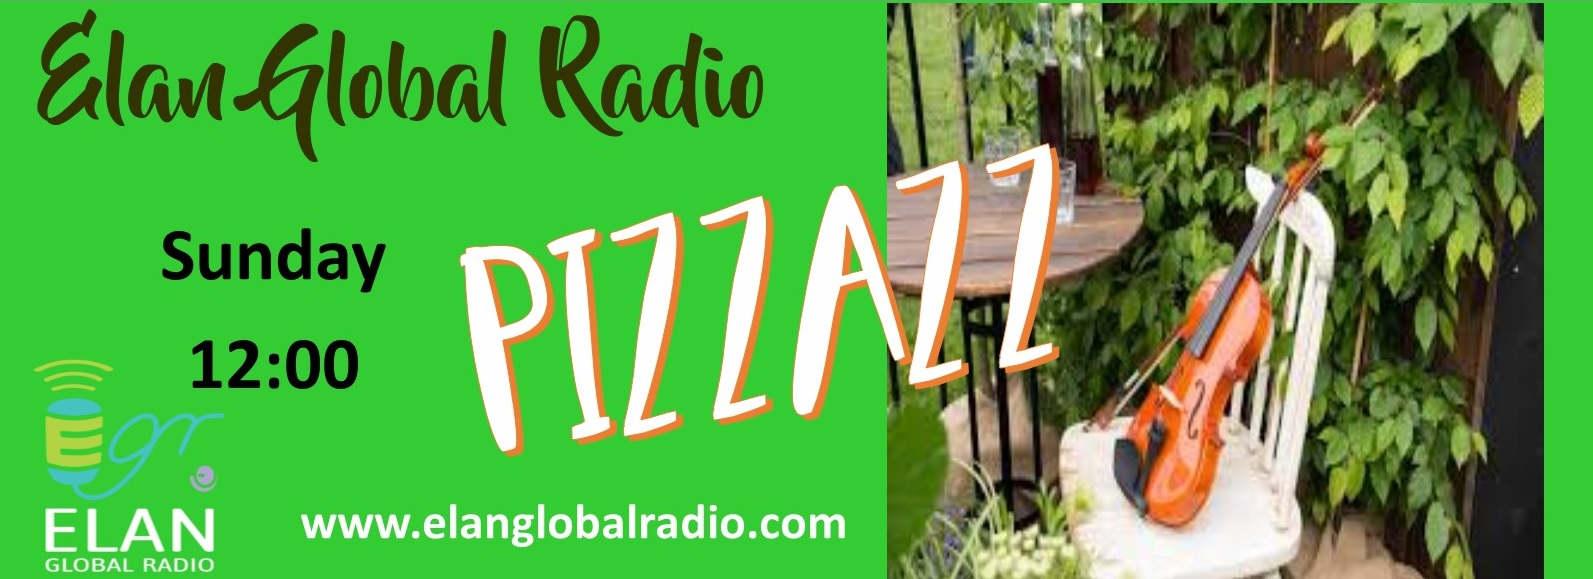 Pizzazz Beatrice Grobler.jpg